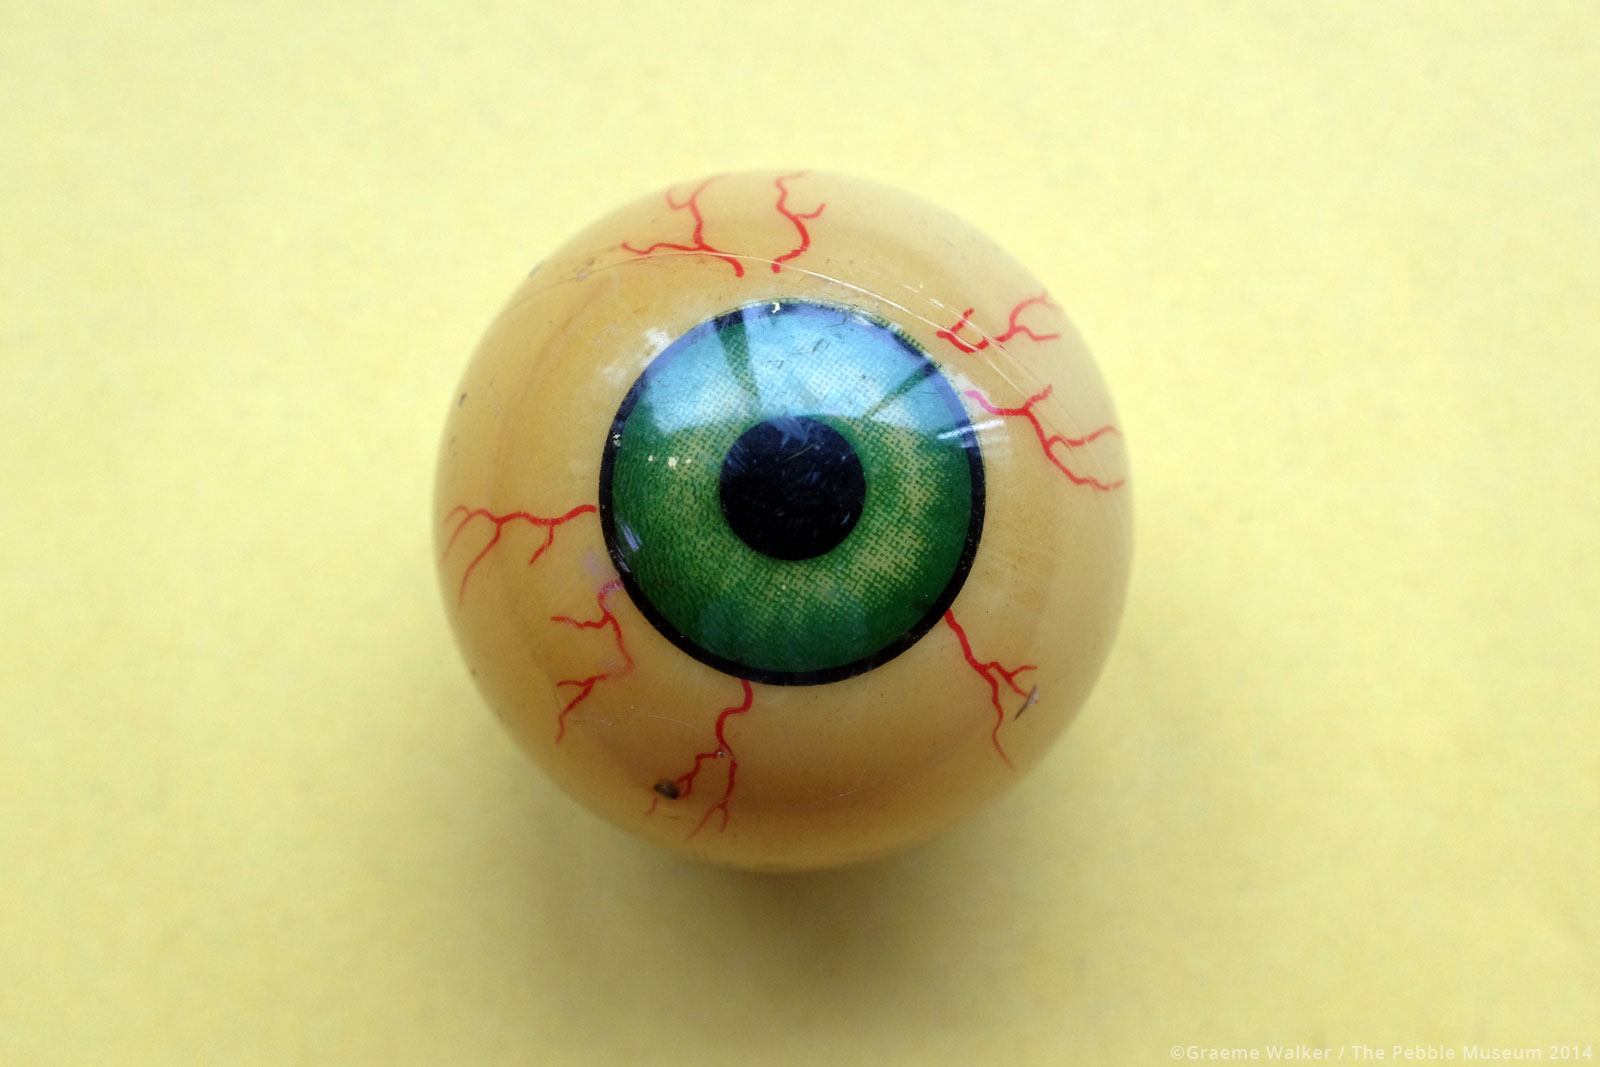 Toy Eye © Graeme Walker / The Pebble Museum 2019